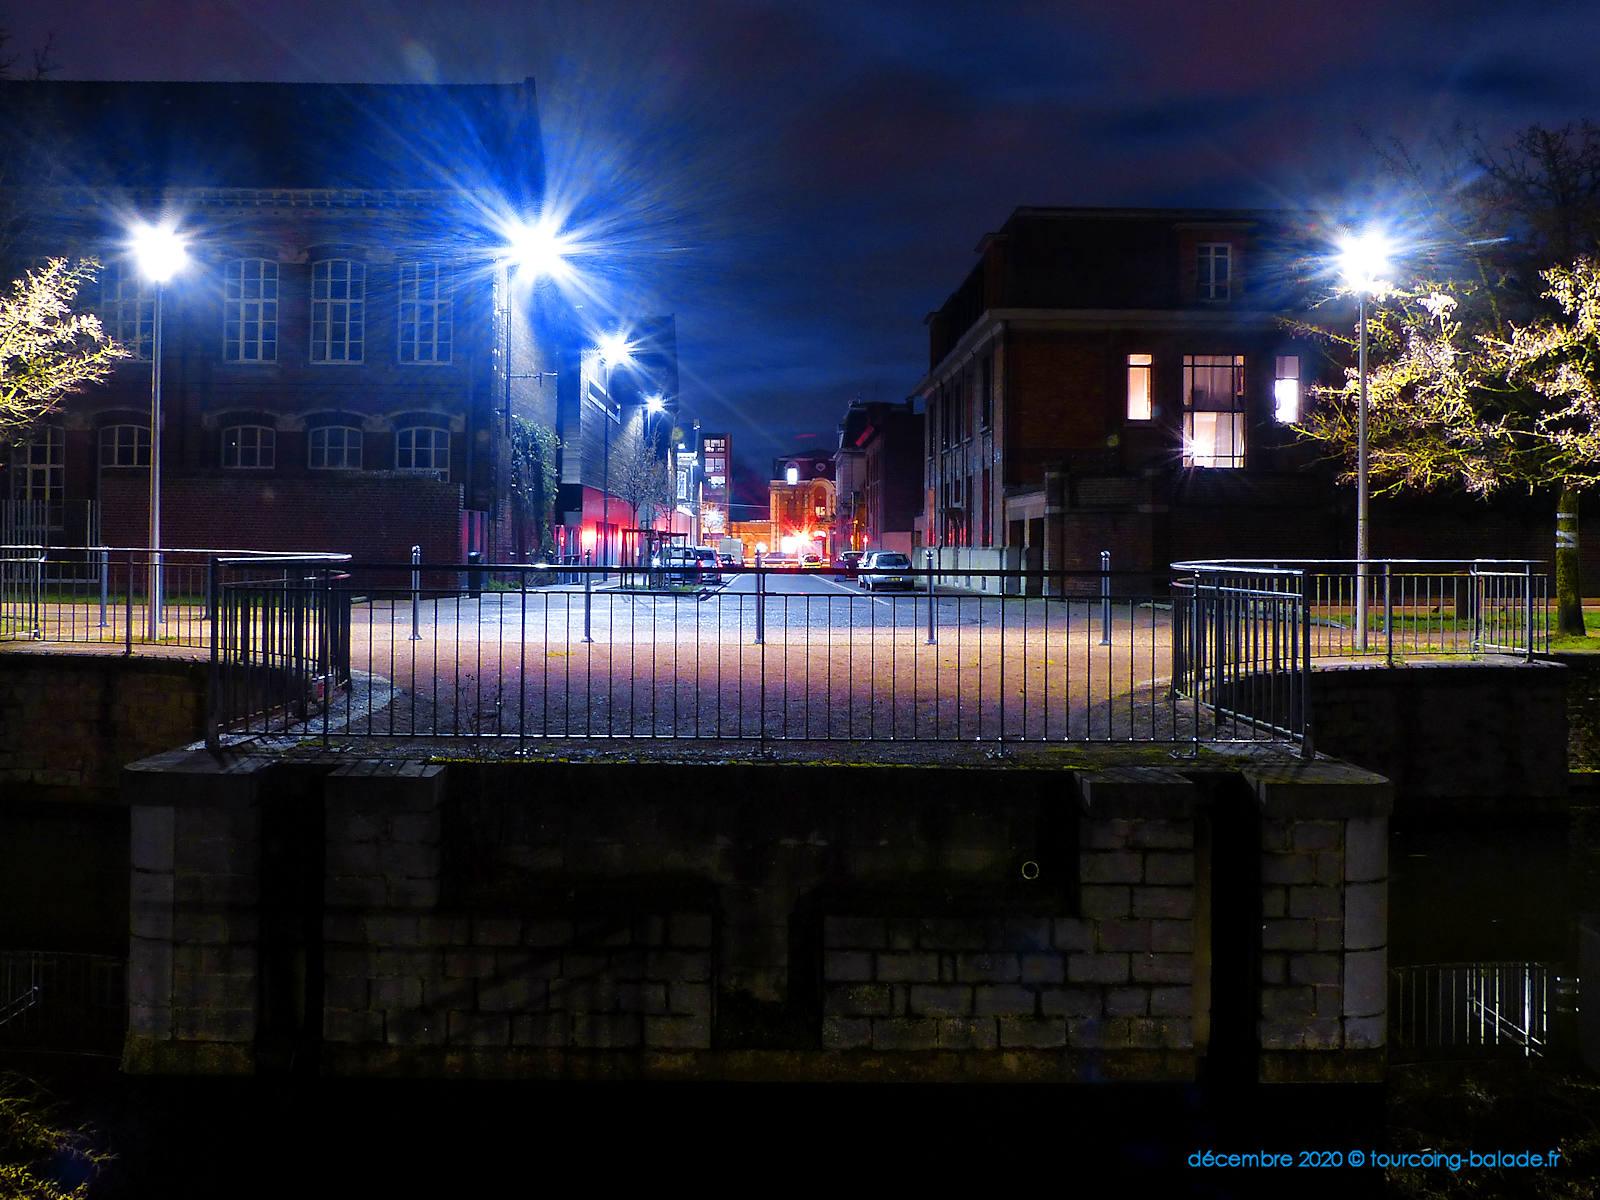 Tourcoing Nuit 2020 - Rue des Quais